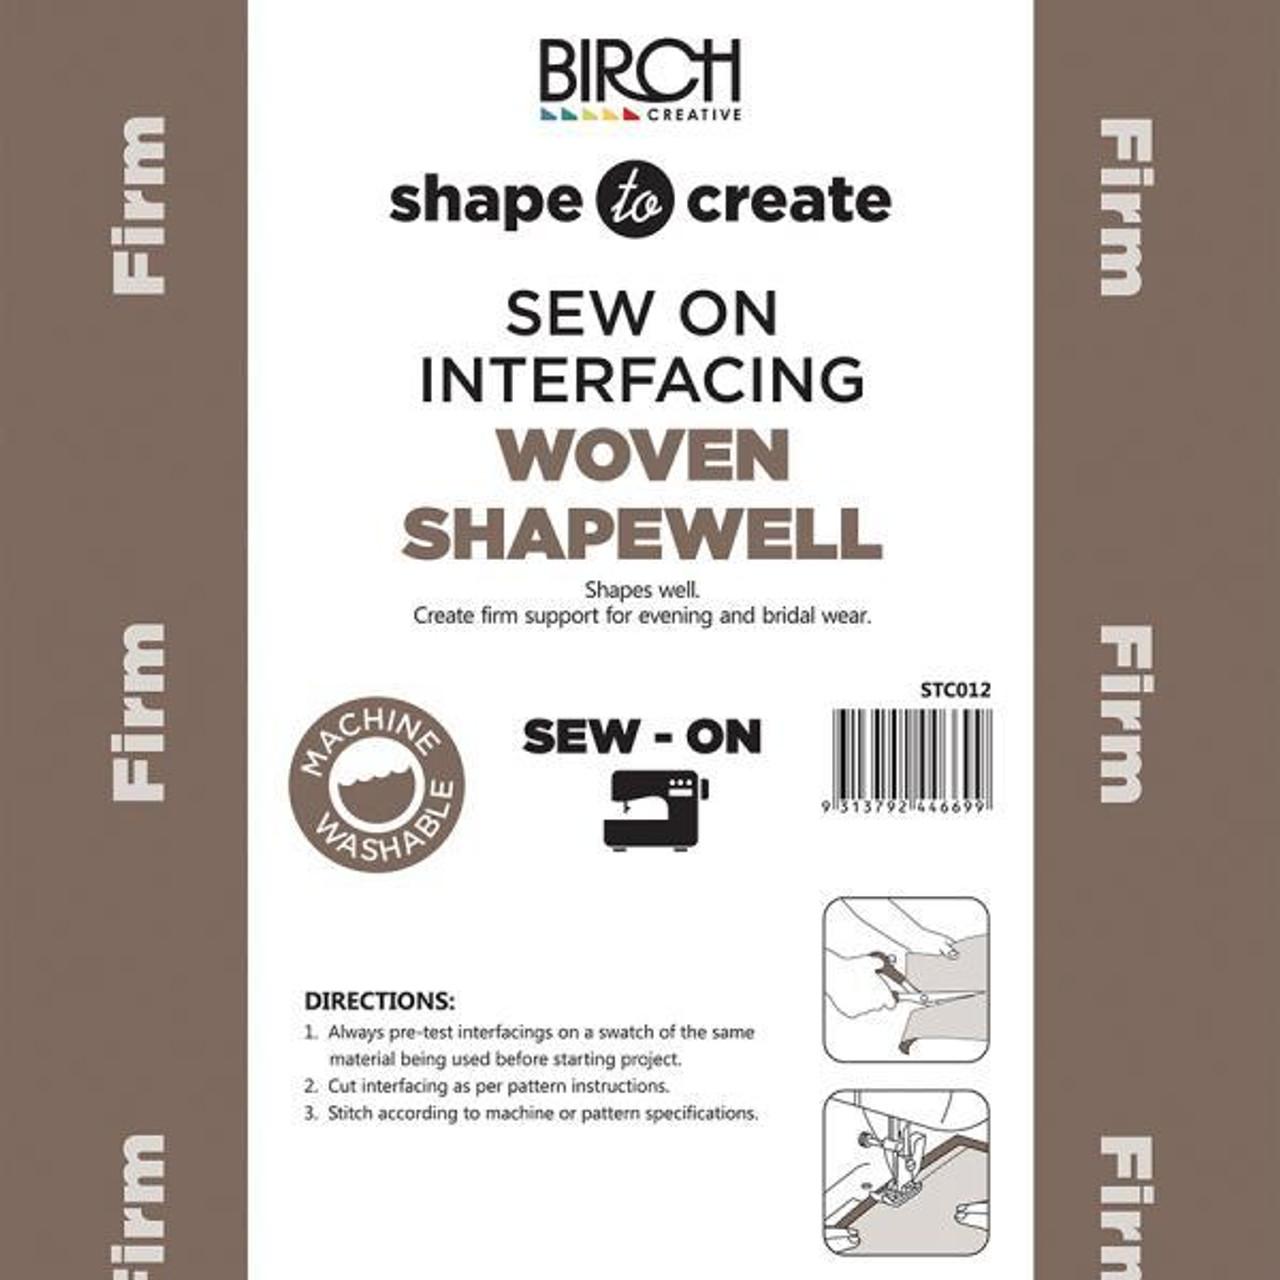 Shape to Create - Sew-in Shapewell